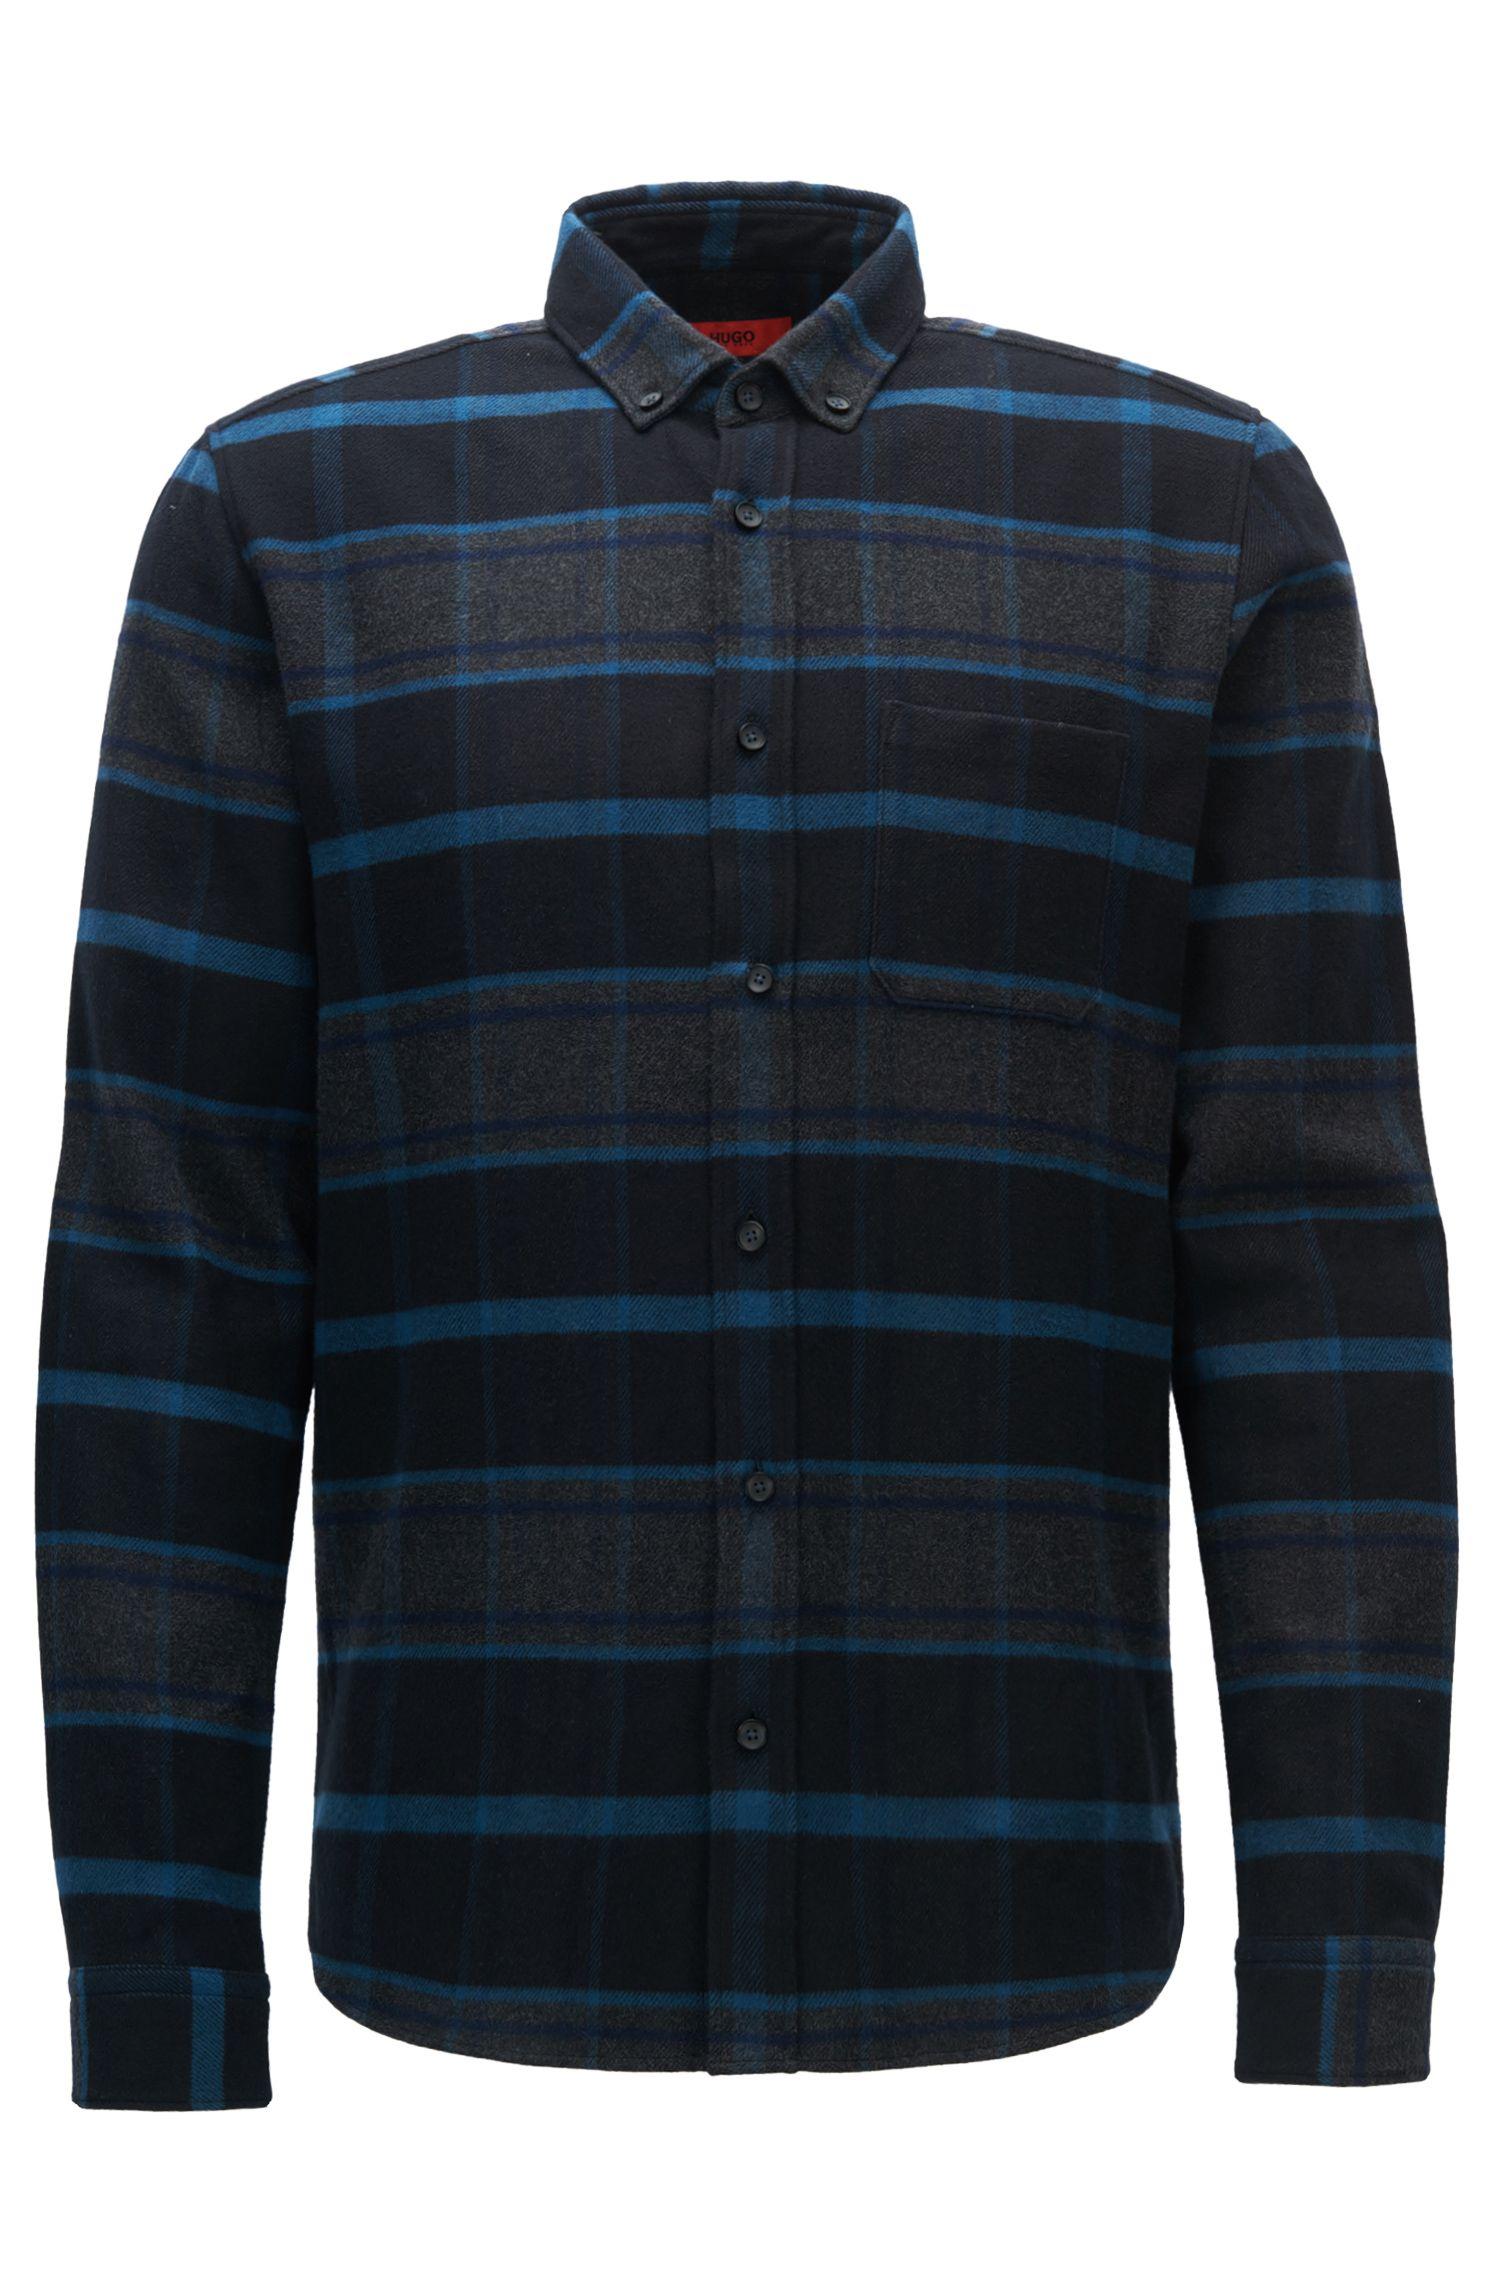 Kariertes Relaxed-Fit Hemd aus Baumwolle